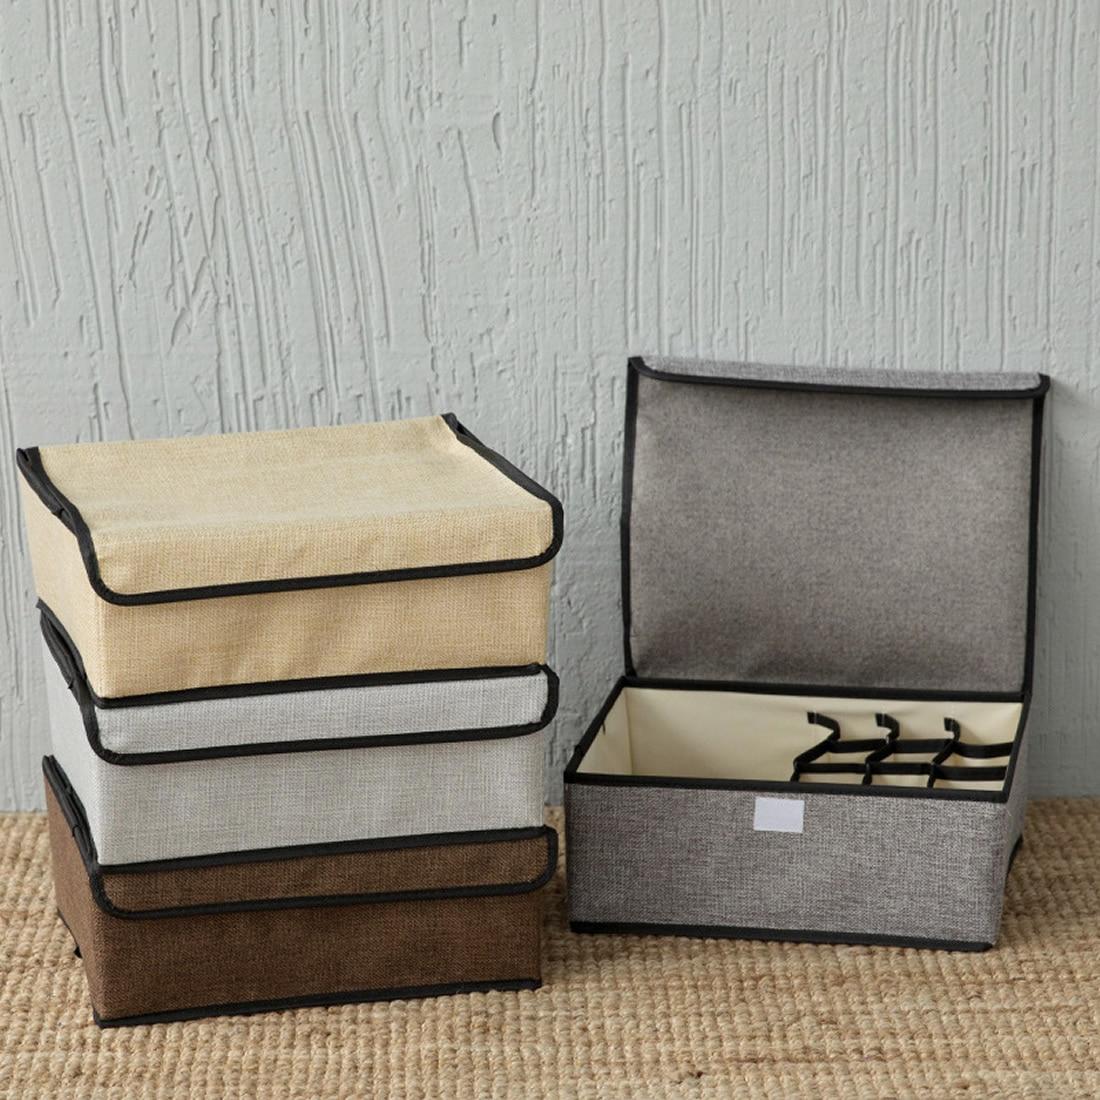 New Non Woven Fabric Folding Underwear Storage Box Bedroom: Home Clothing Wardrobe Storage Boxes Drawer Organizers